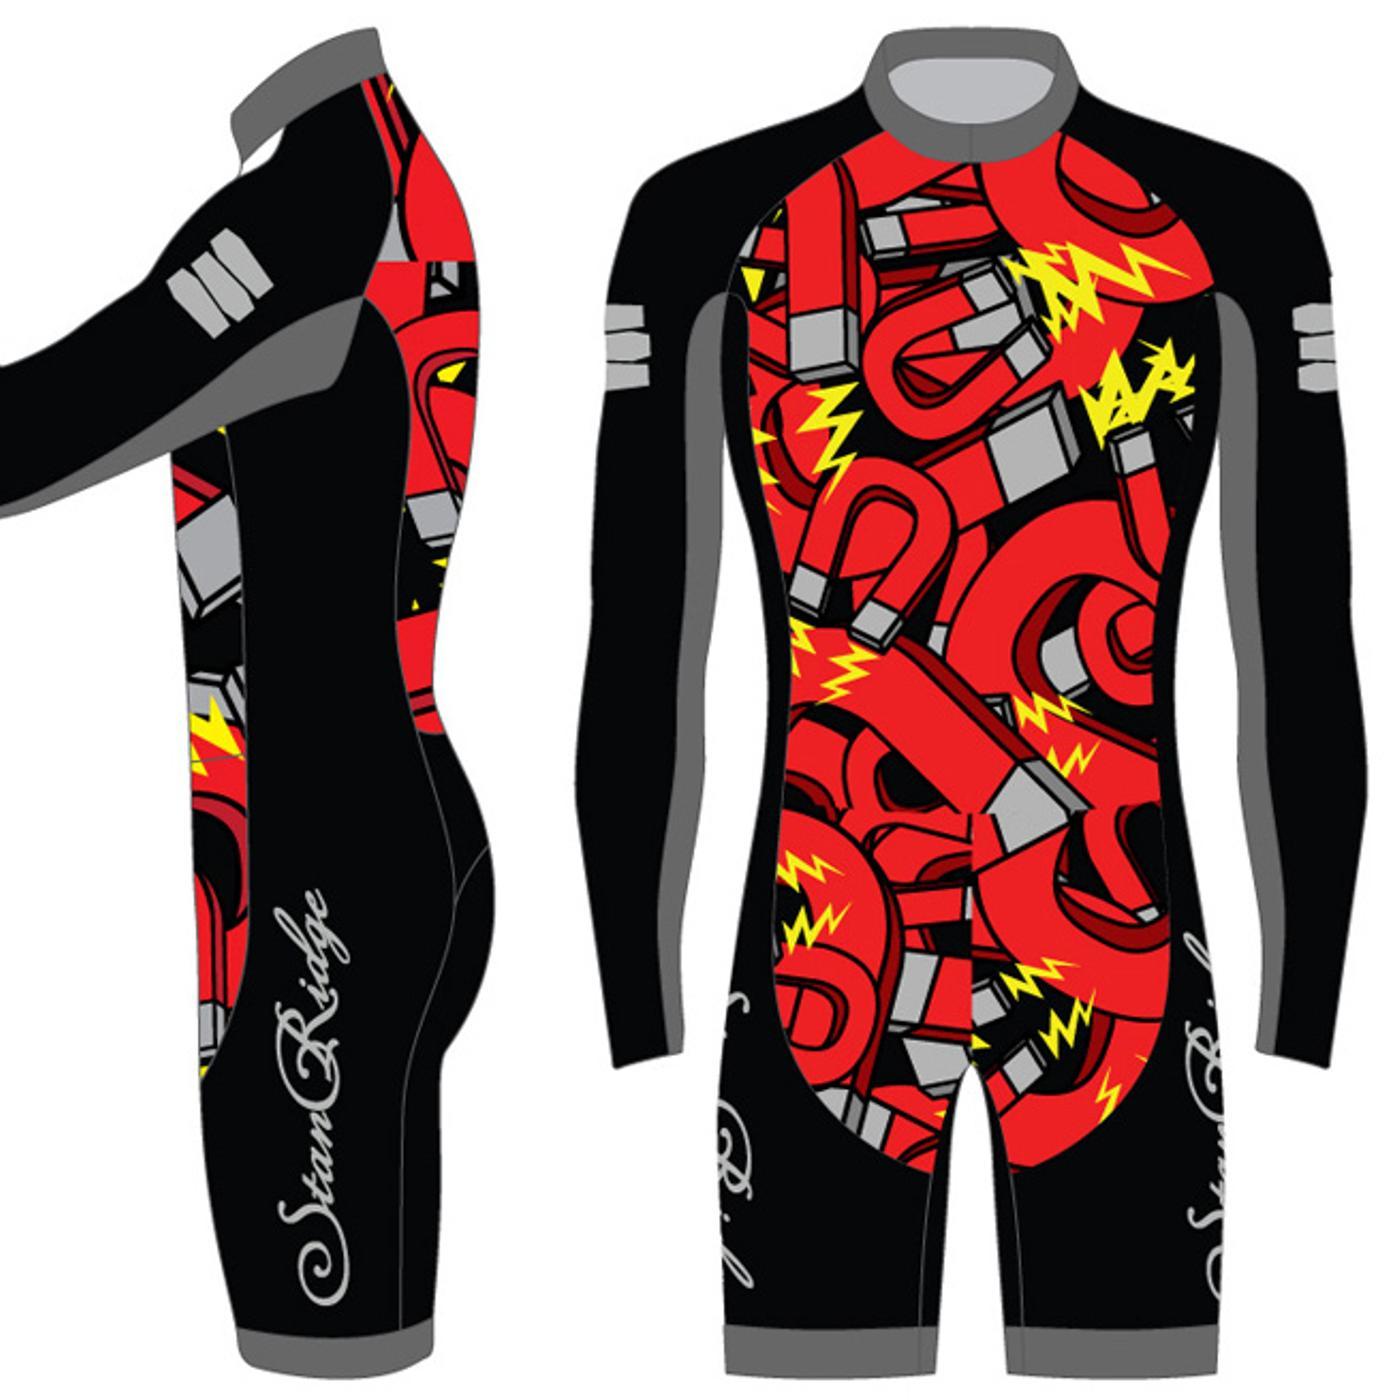 The Death Spray Custom Stanridge Speed Skinsuit by ENDO